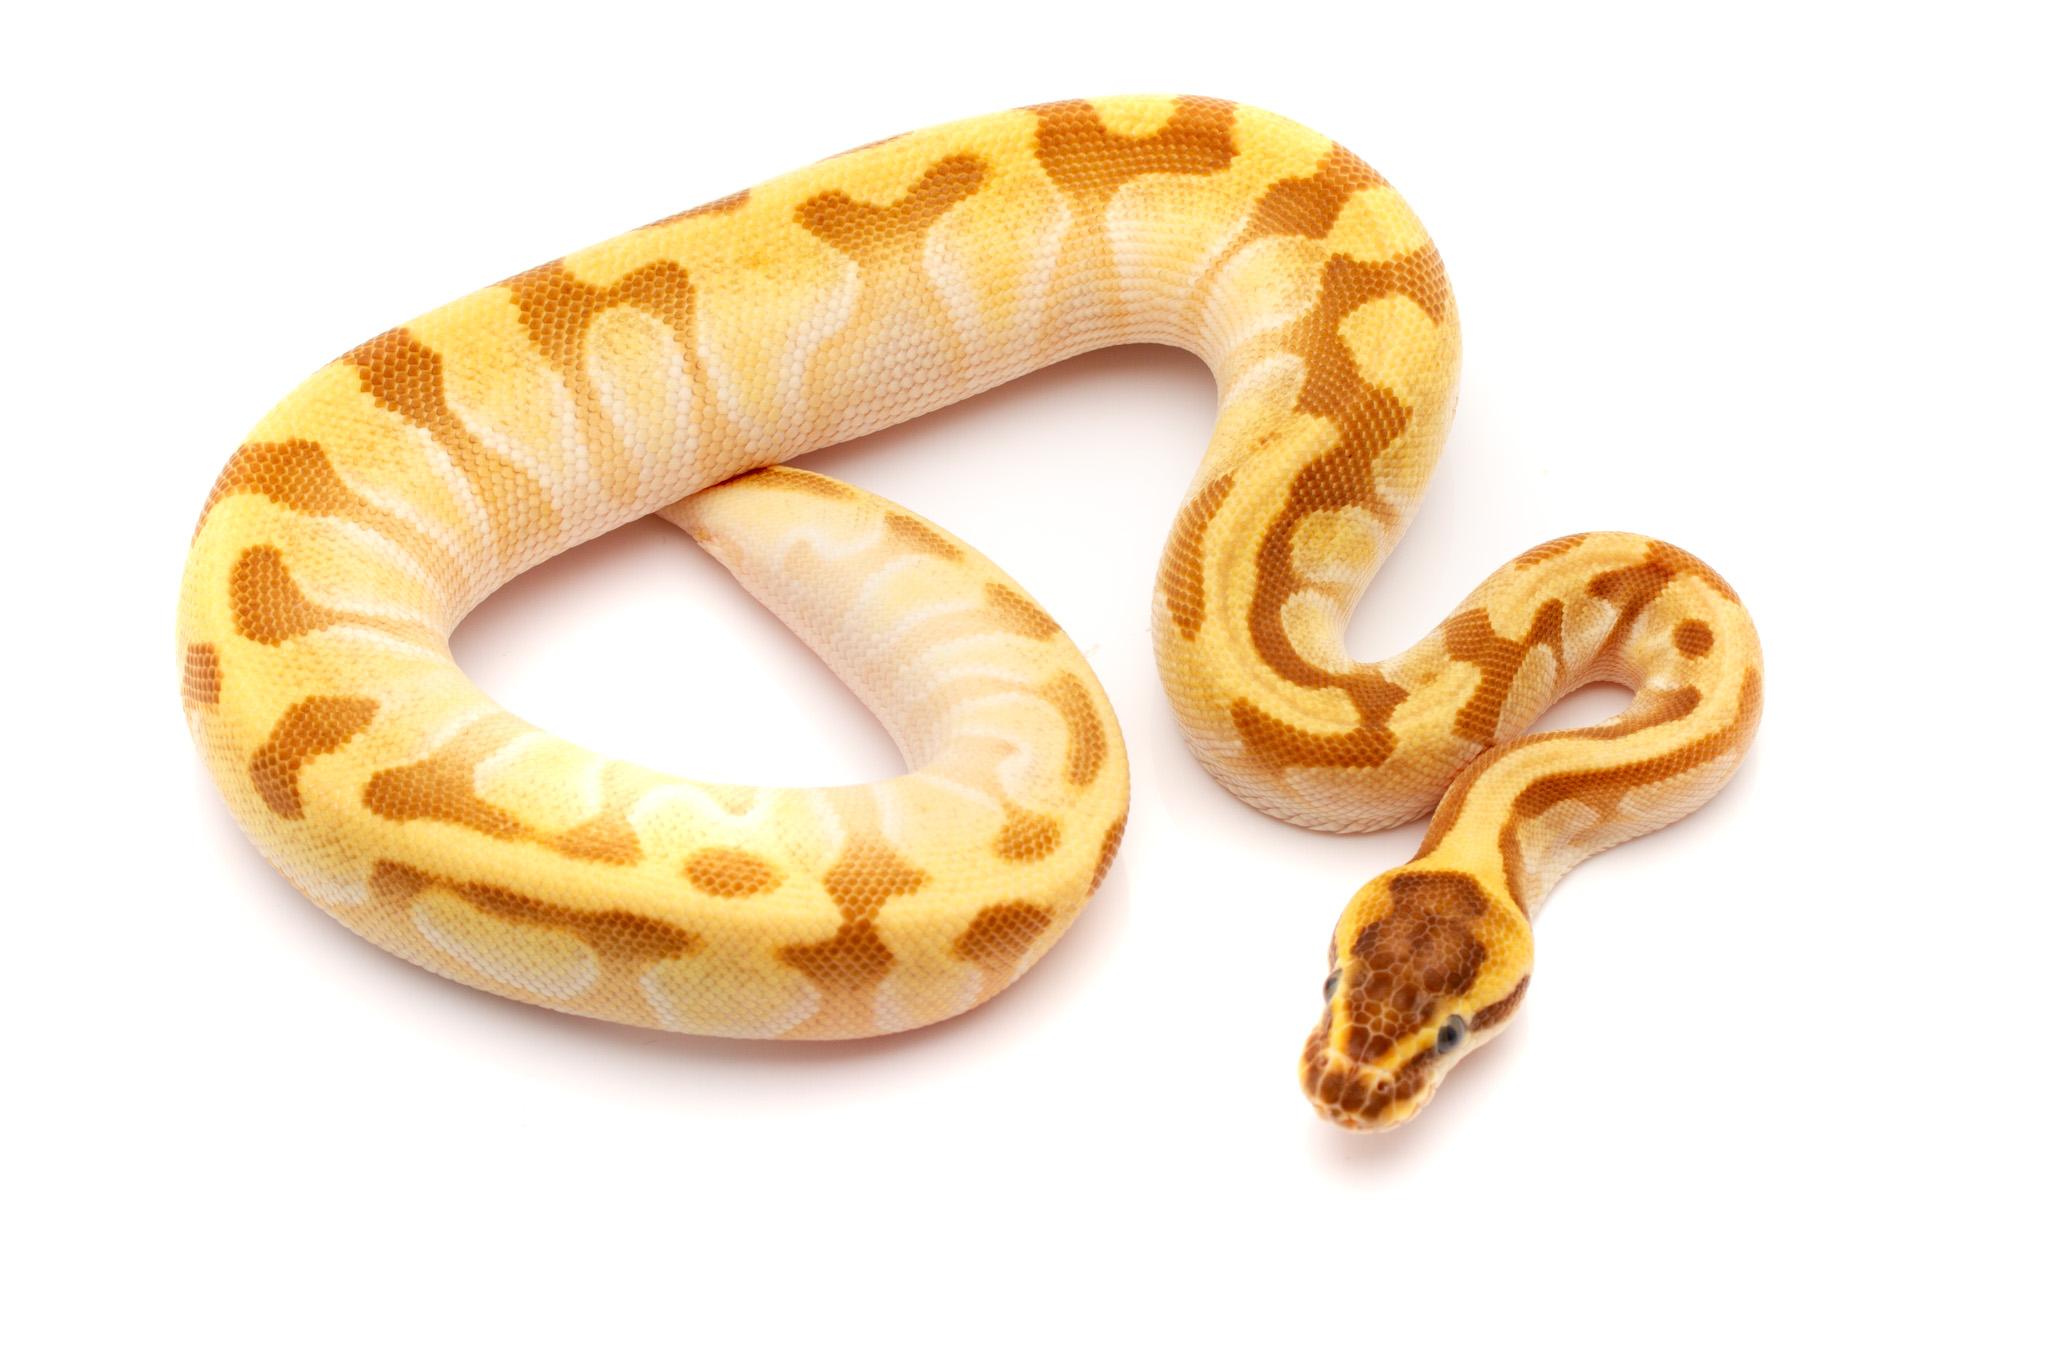 Super enchi for ball python for sale